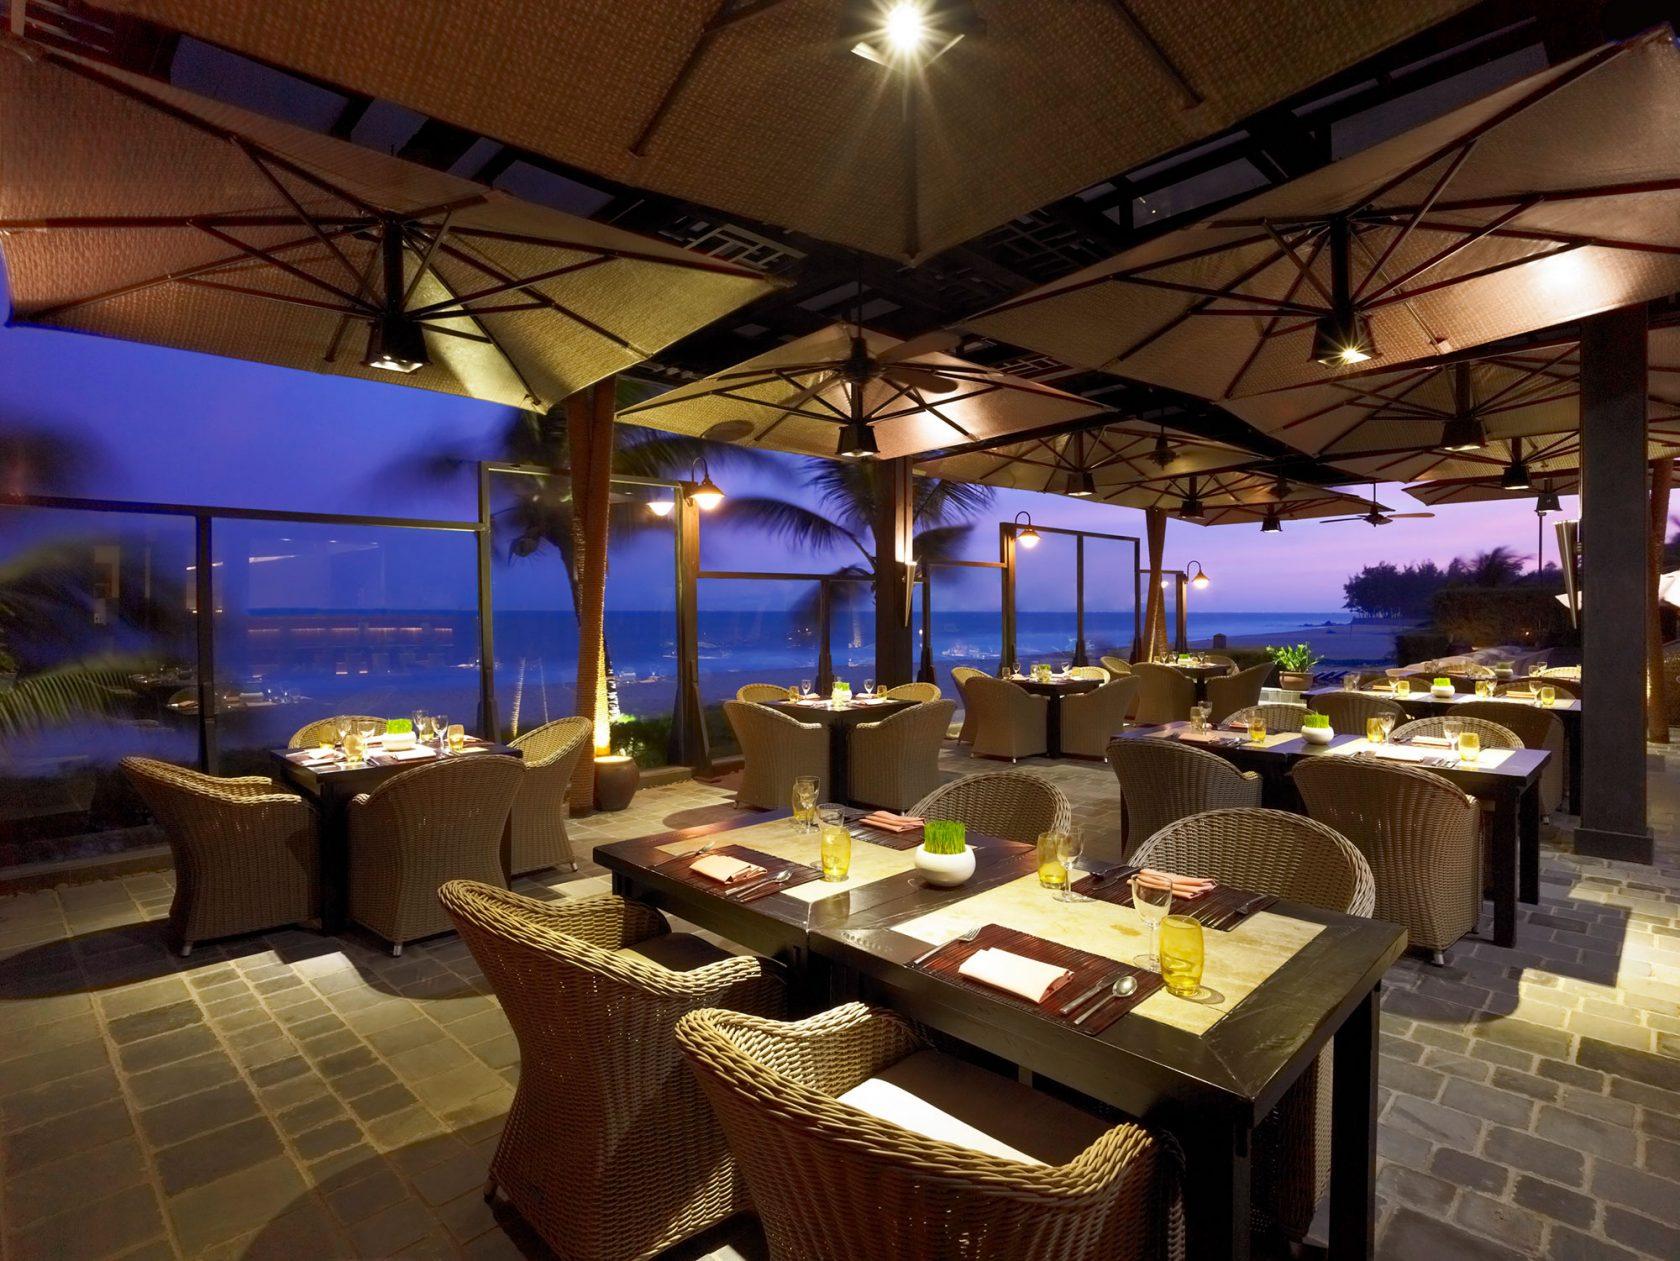 Anantara Mui Ne Thung Restaurant